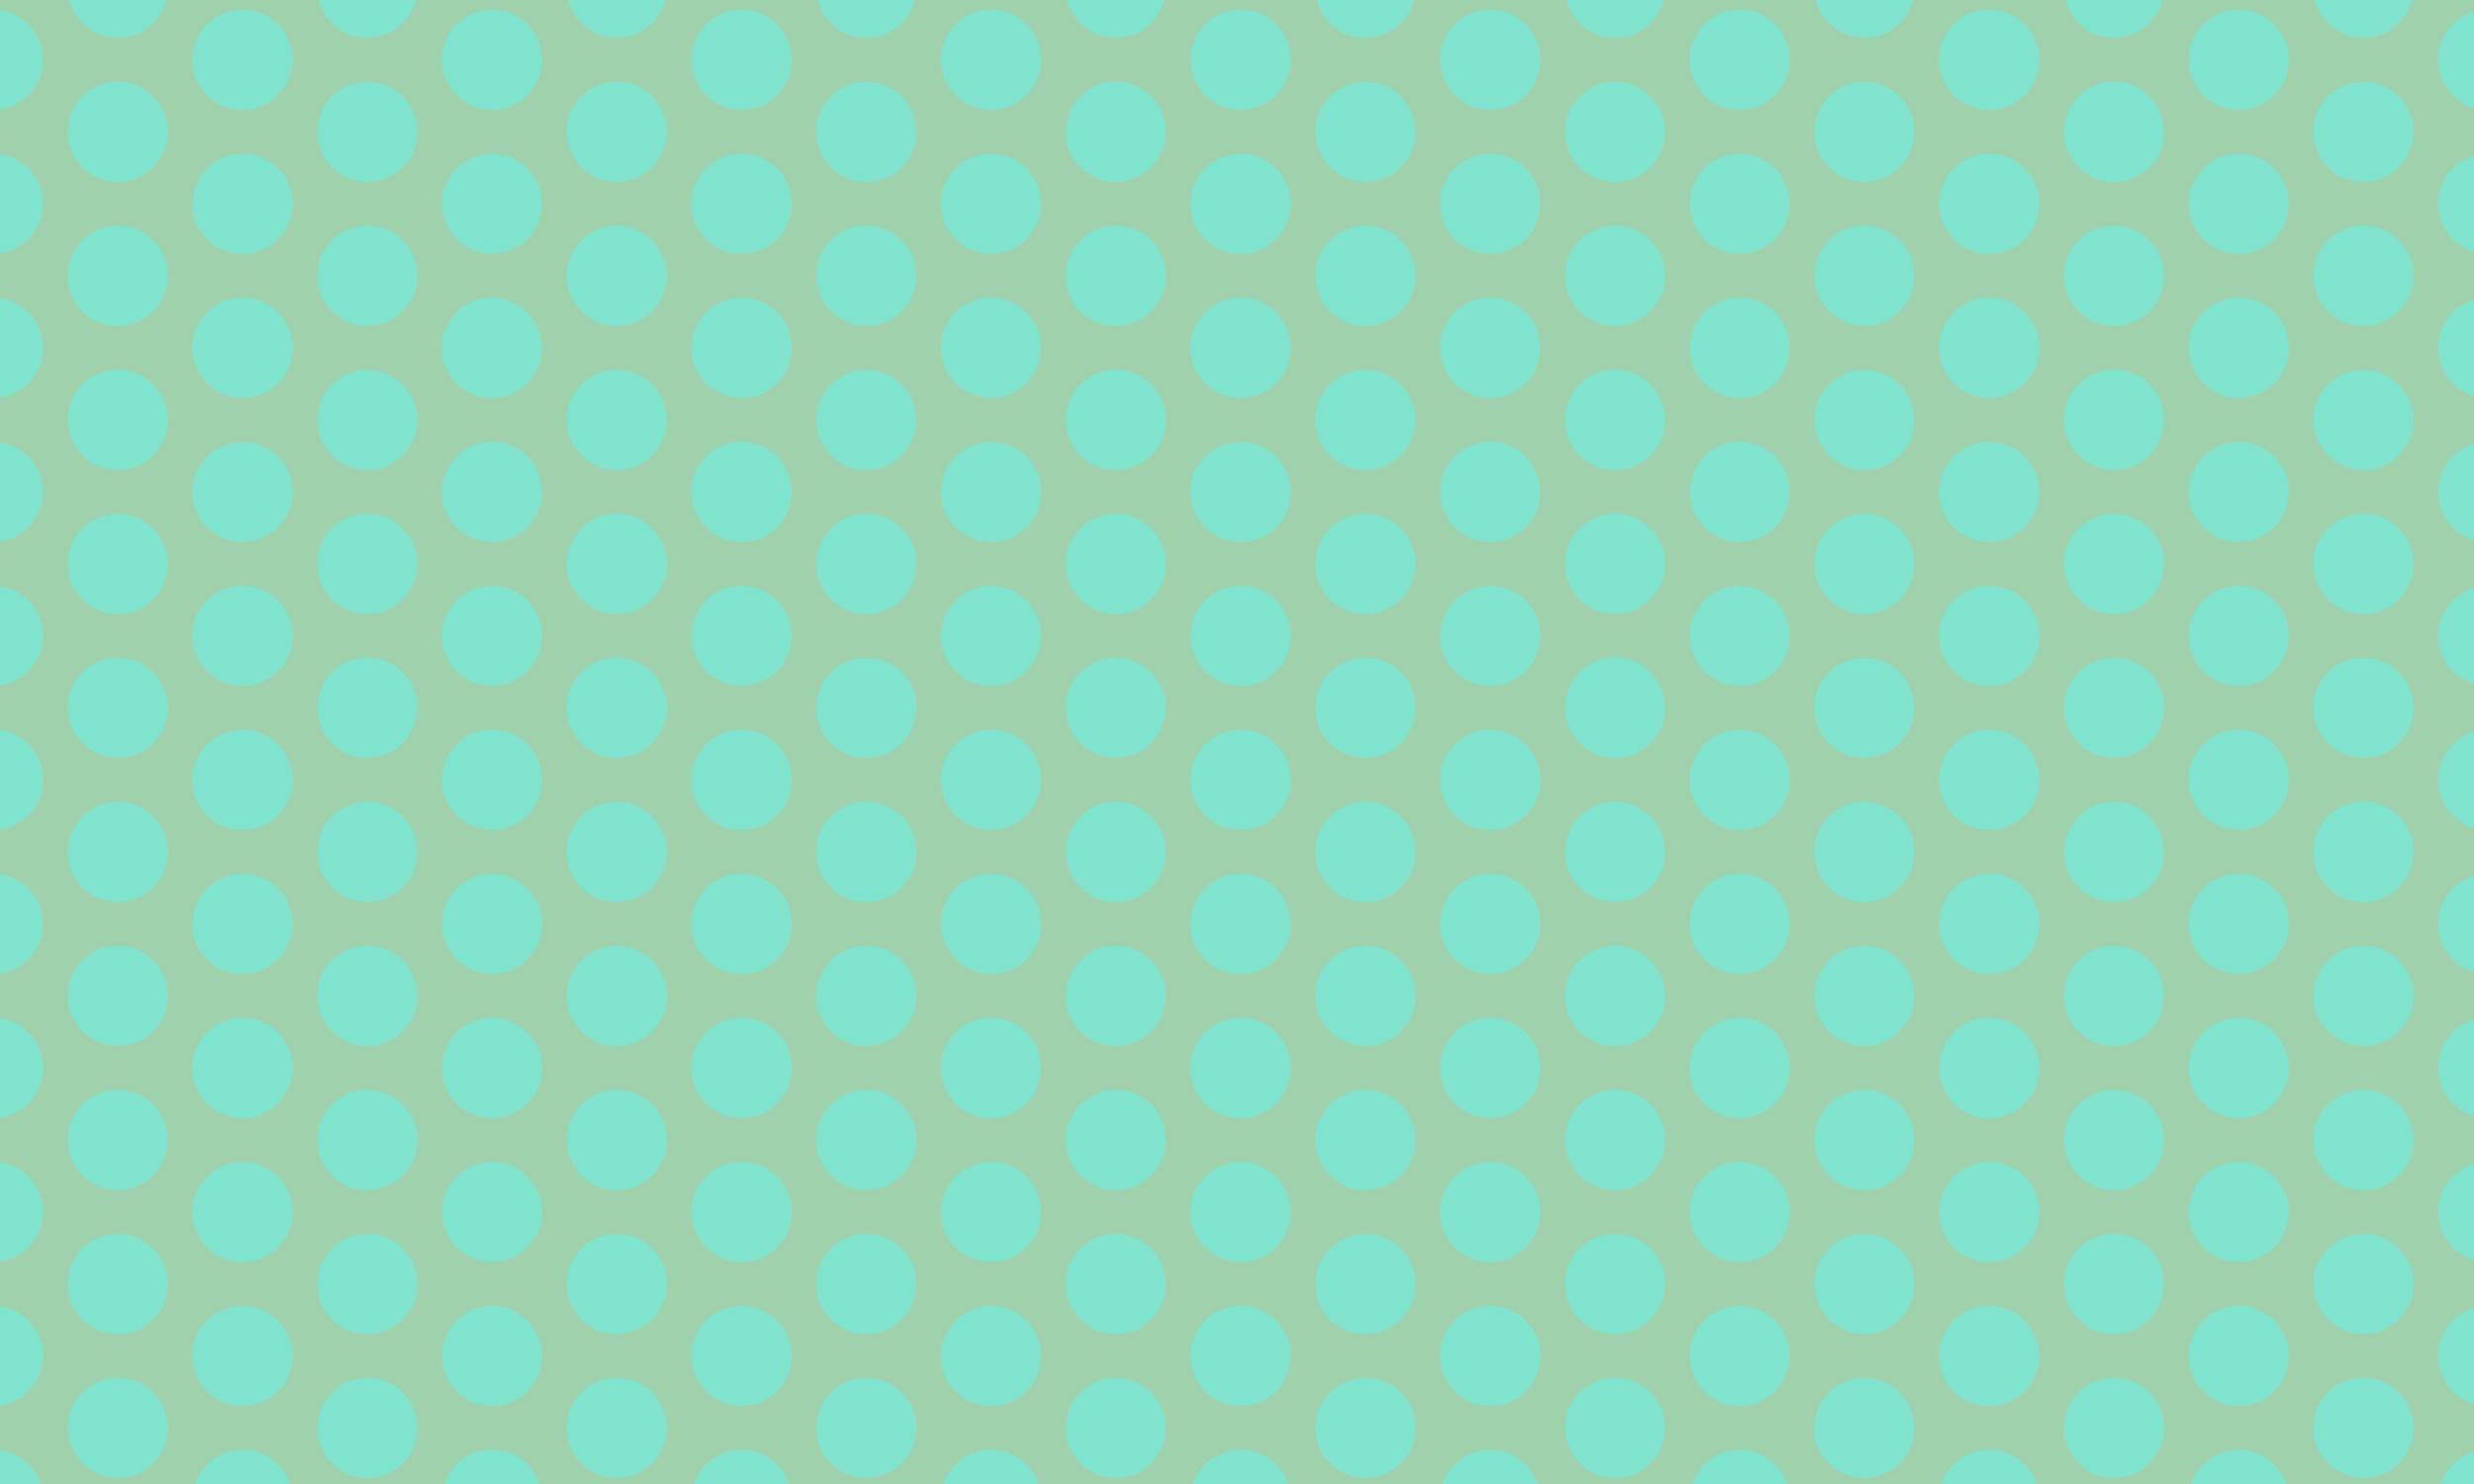 Circle mint pattern